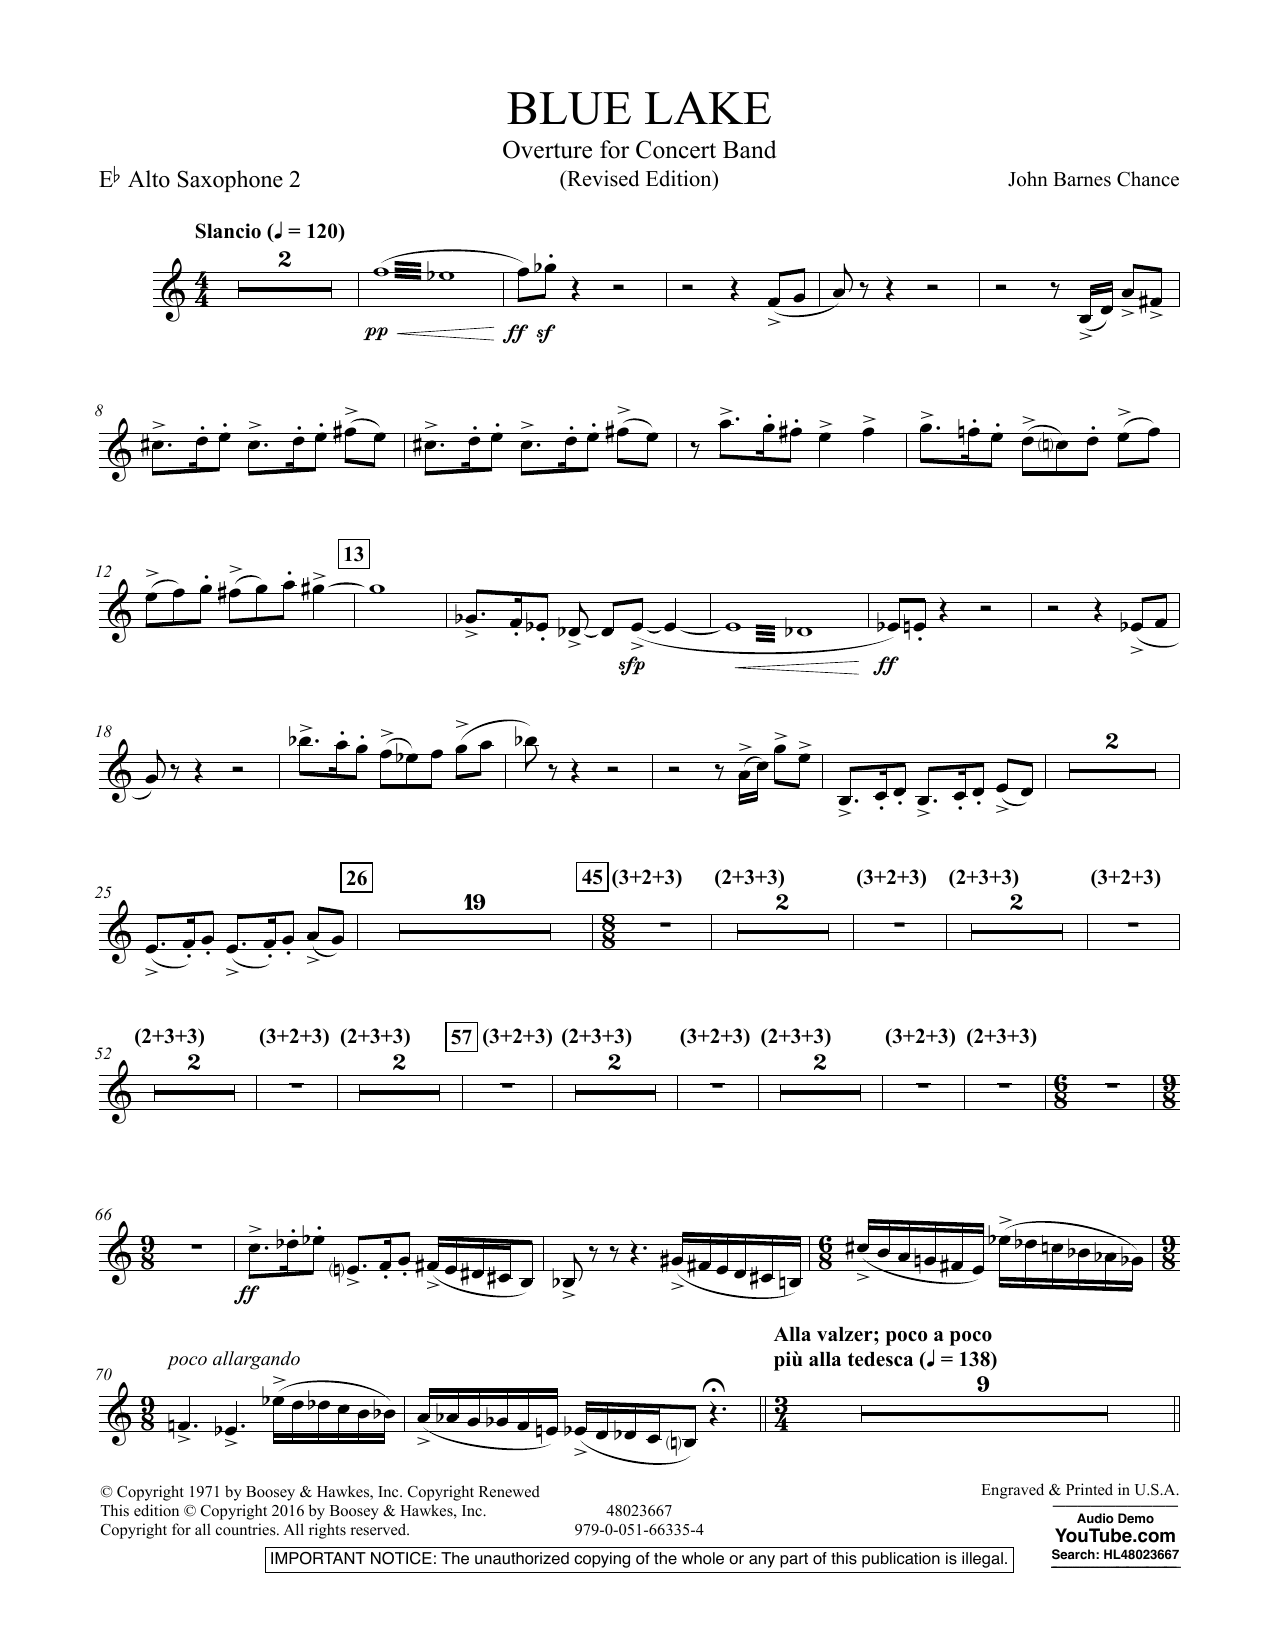 Blue Lake (Overture for Concert Band) - Eb Alto Saxophone 2 (Concert Band)